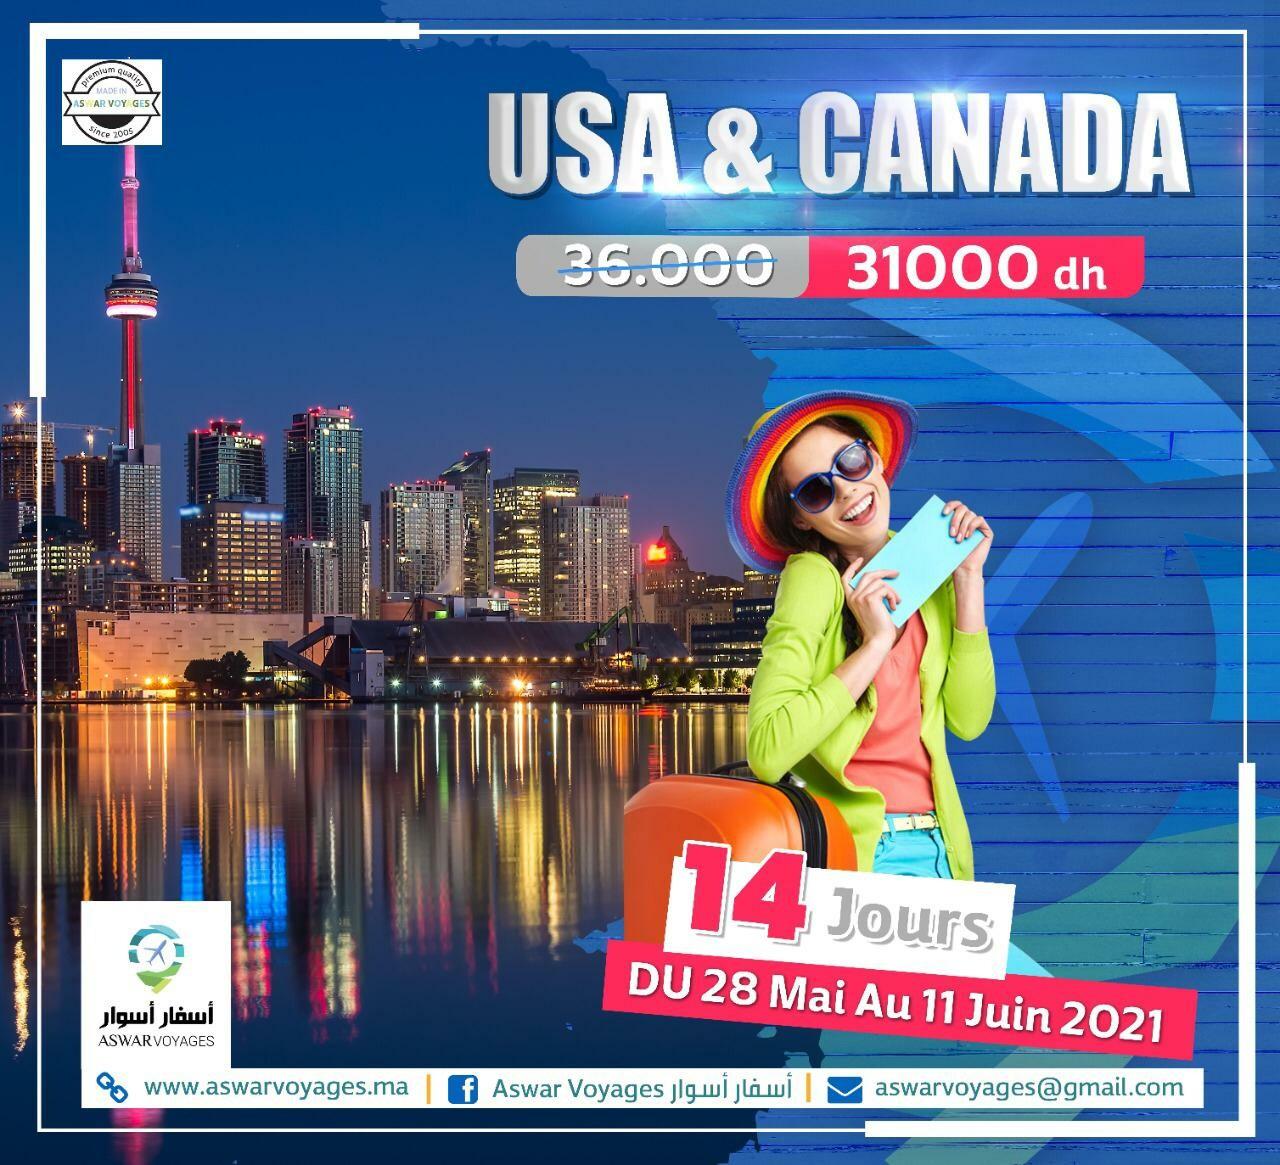 USA -CANADA